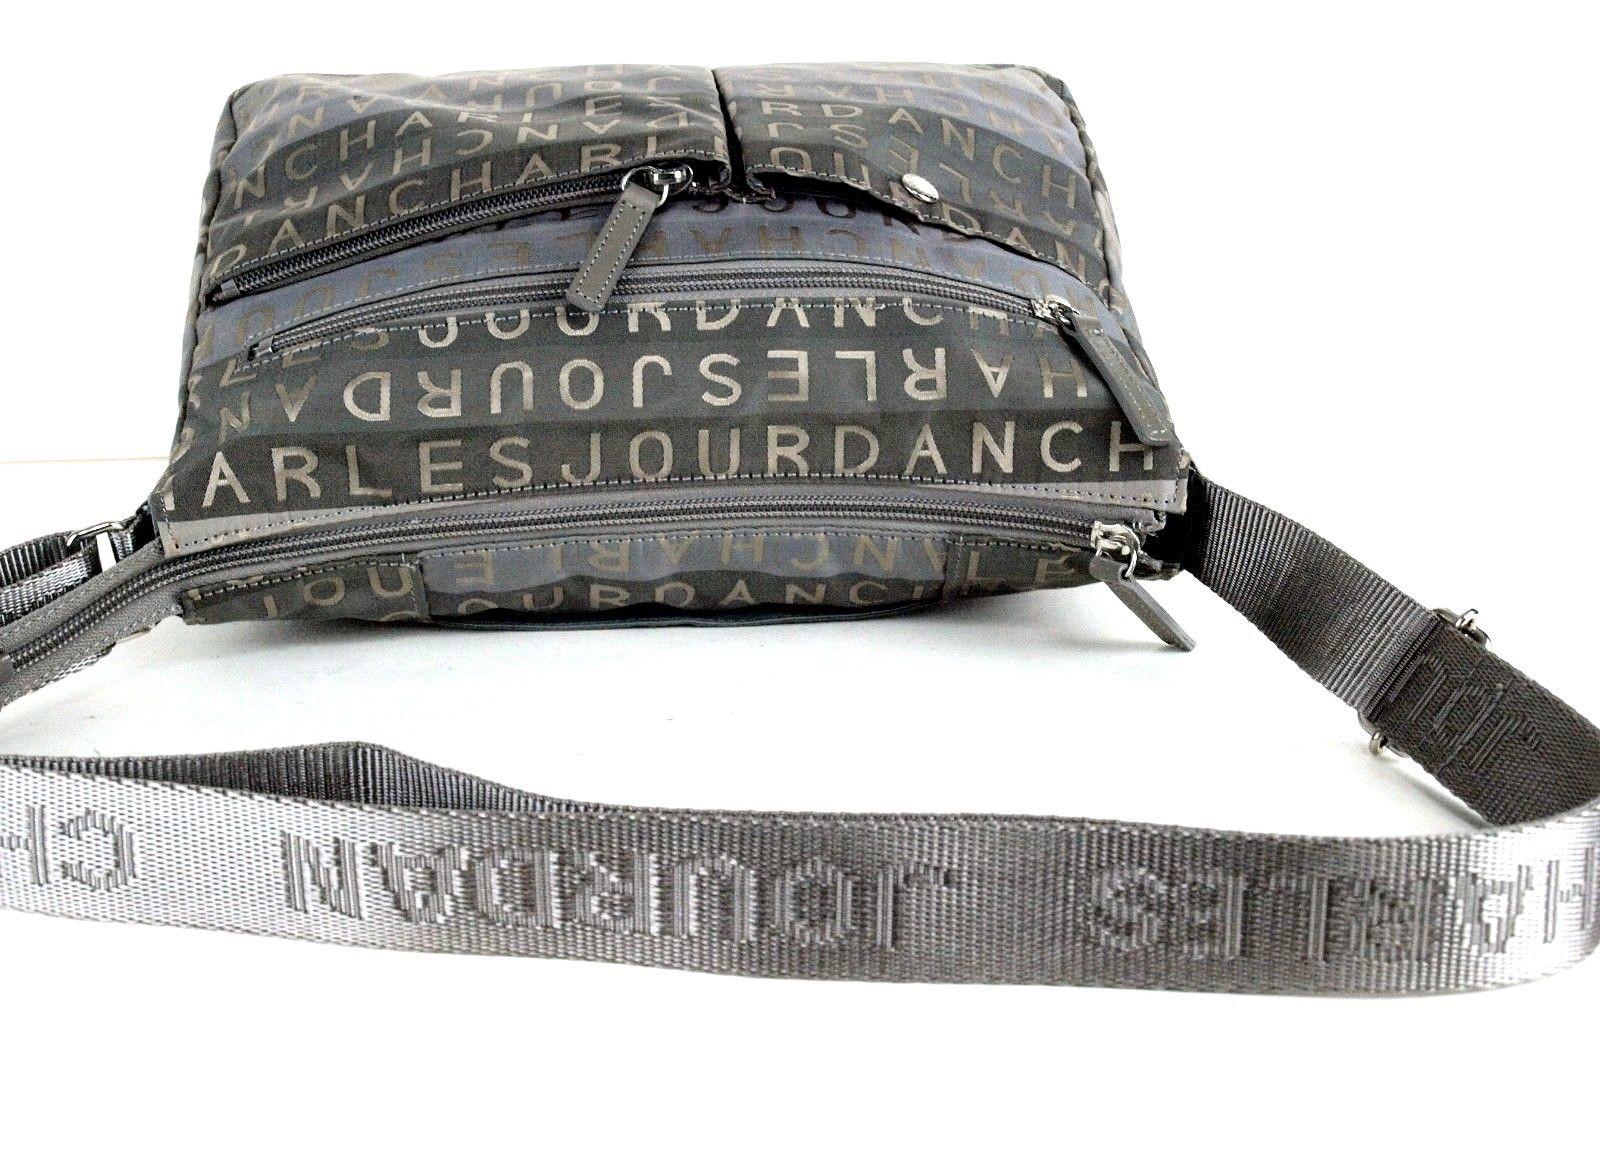 714b31fd8907 Auth CHARLES JOURDAN Paris Logo Nylon Canvas Shoulder Bag Purse Good  Condition.